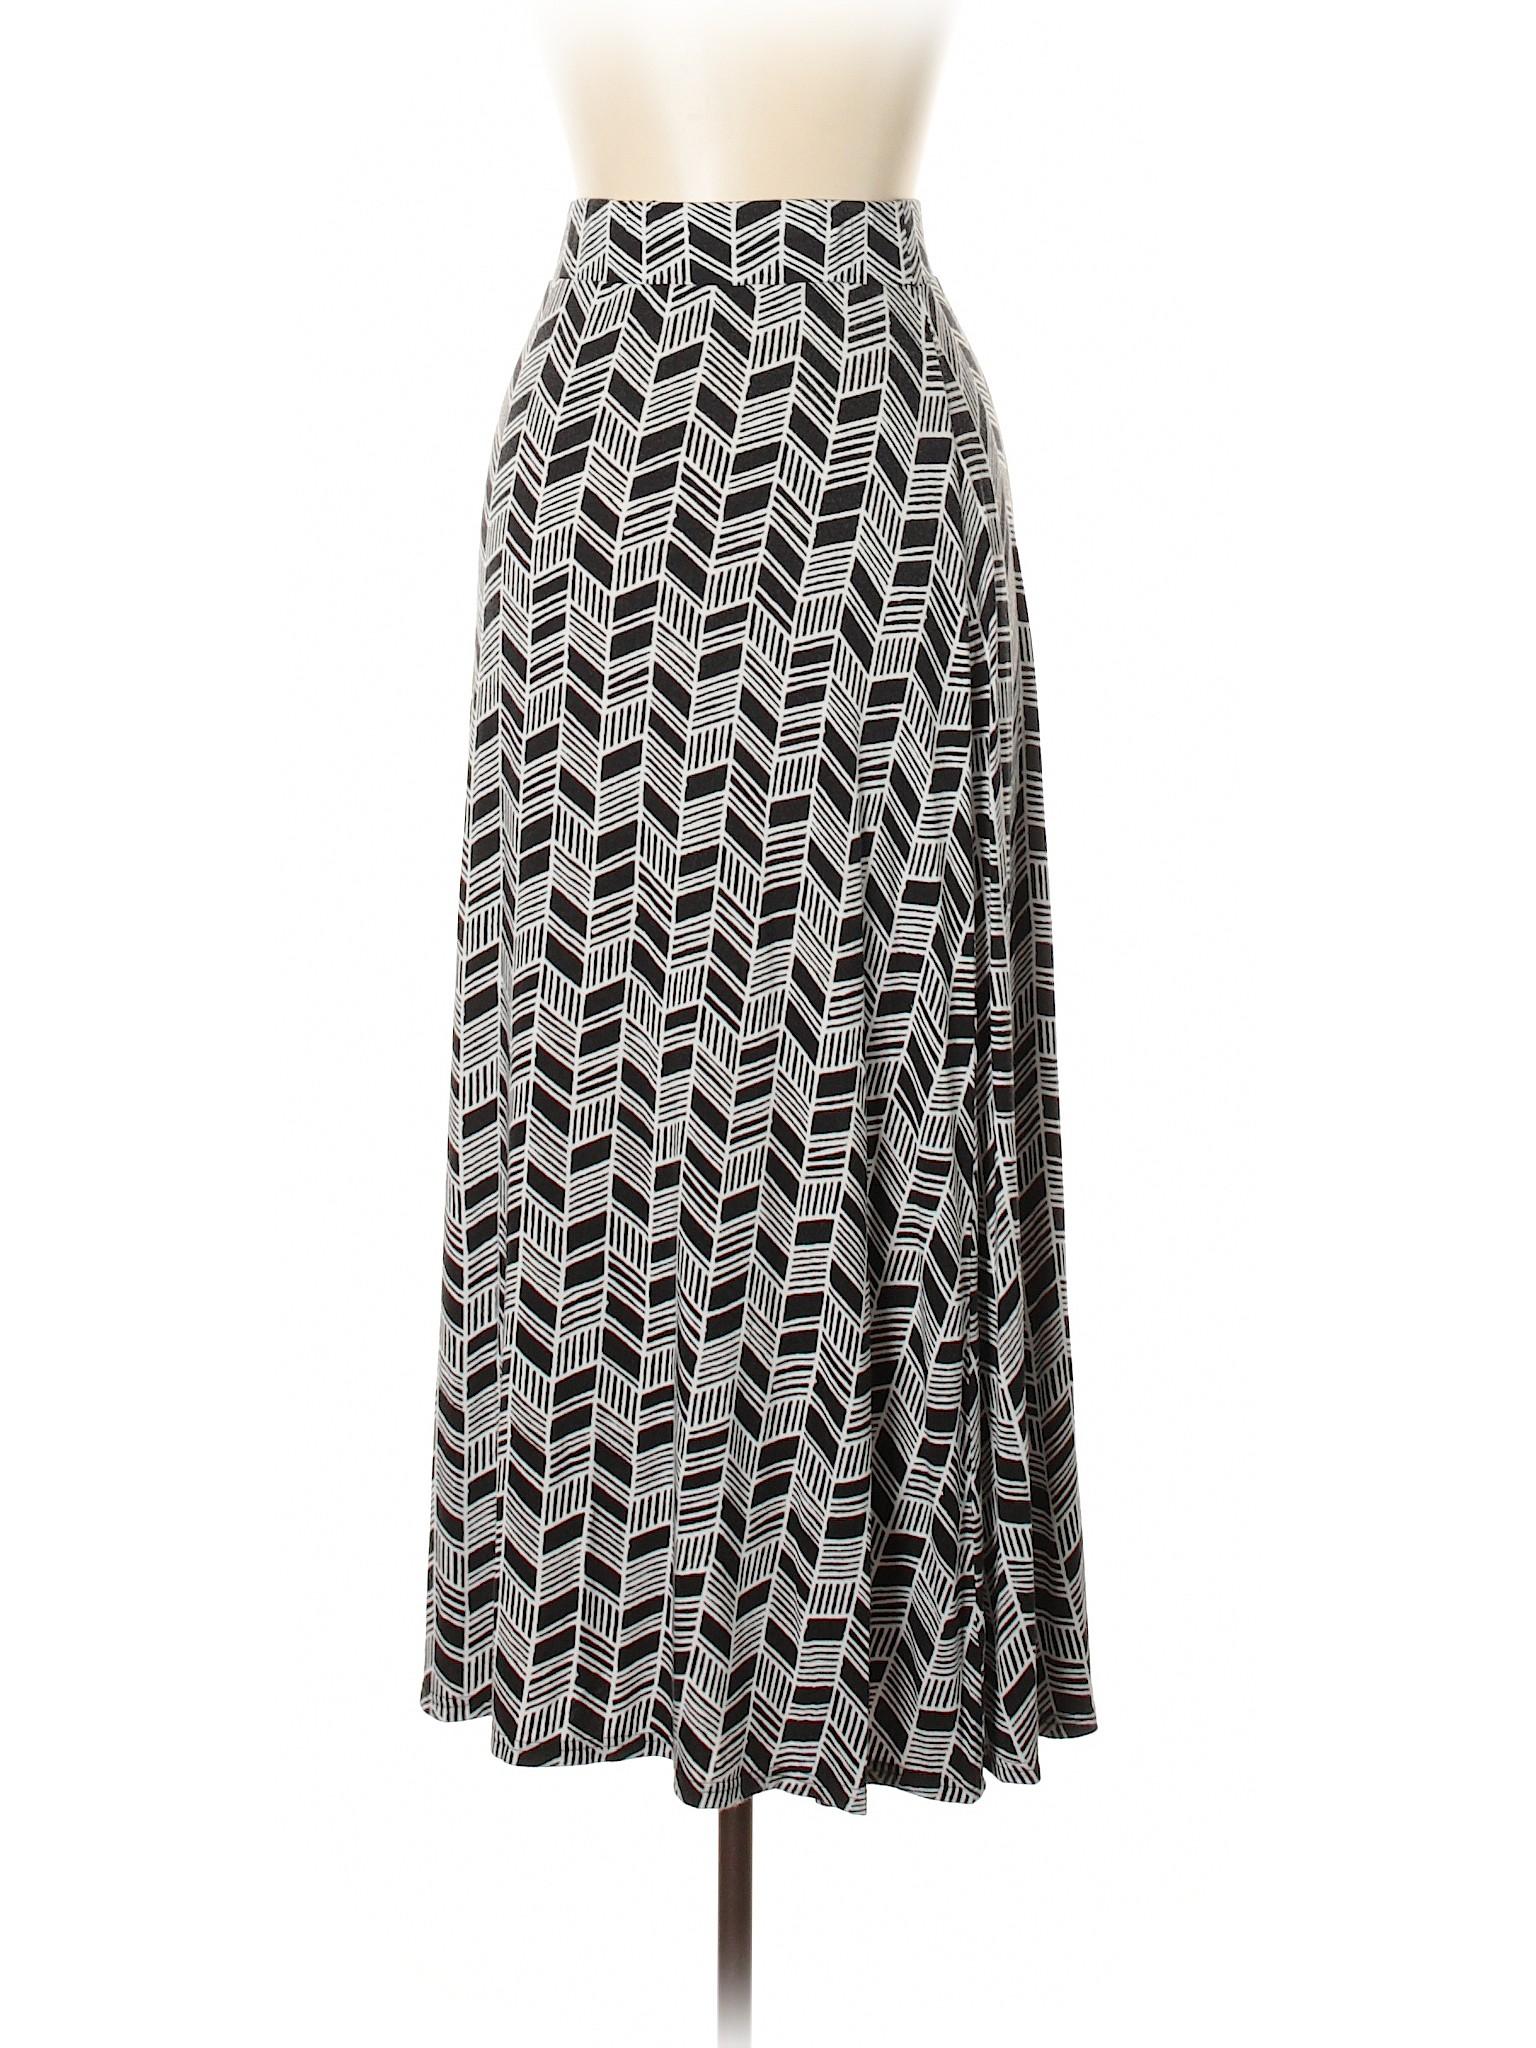 Boutique Lane Casual Skirt Lane Boutique Bryant Bryant rTwF7Rrq